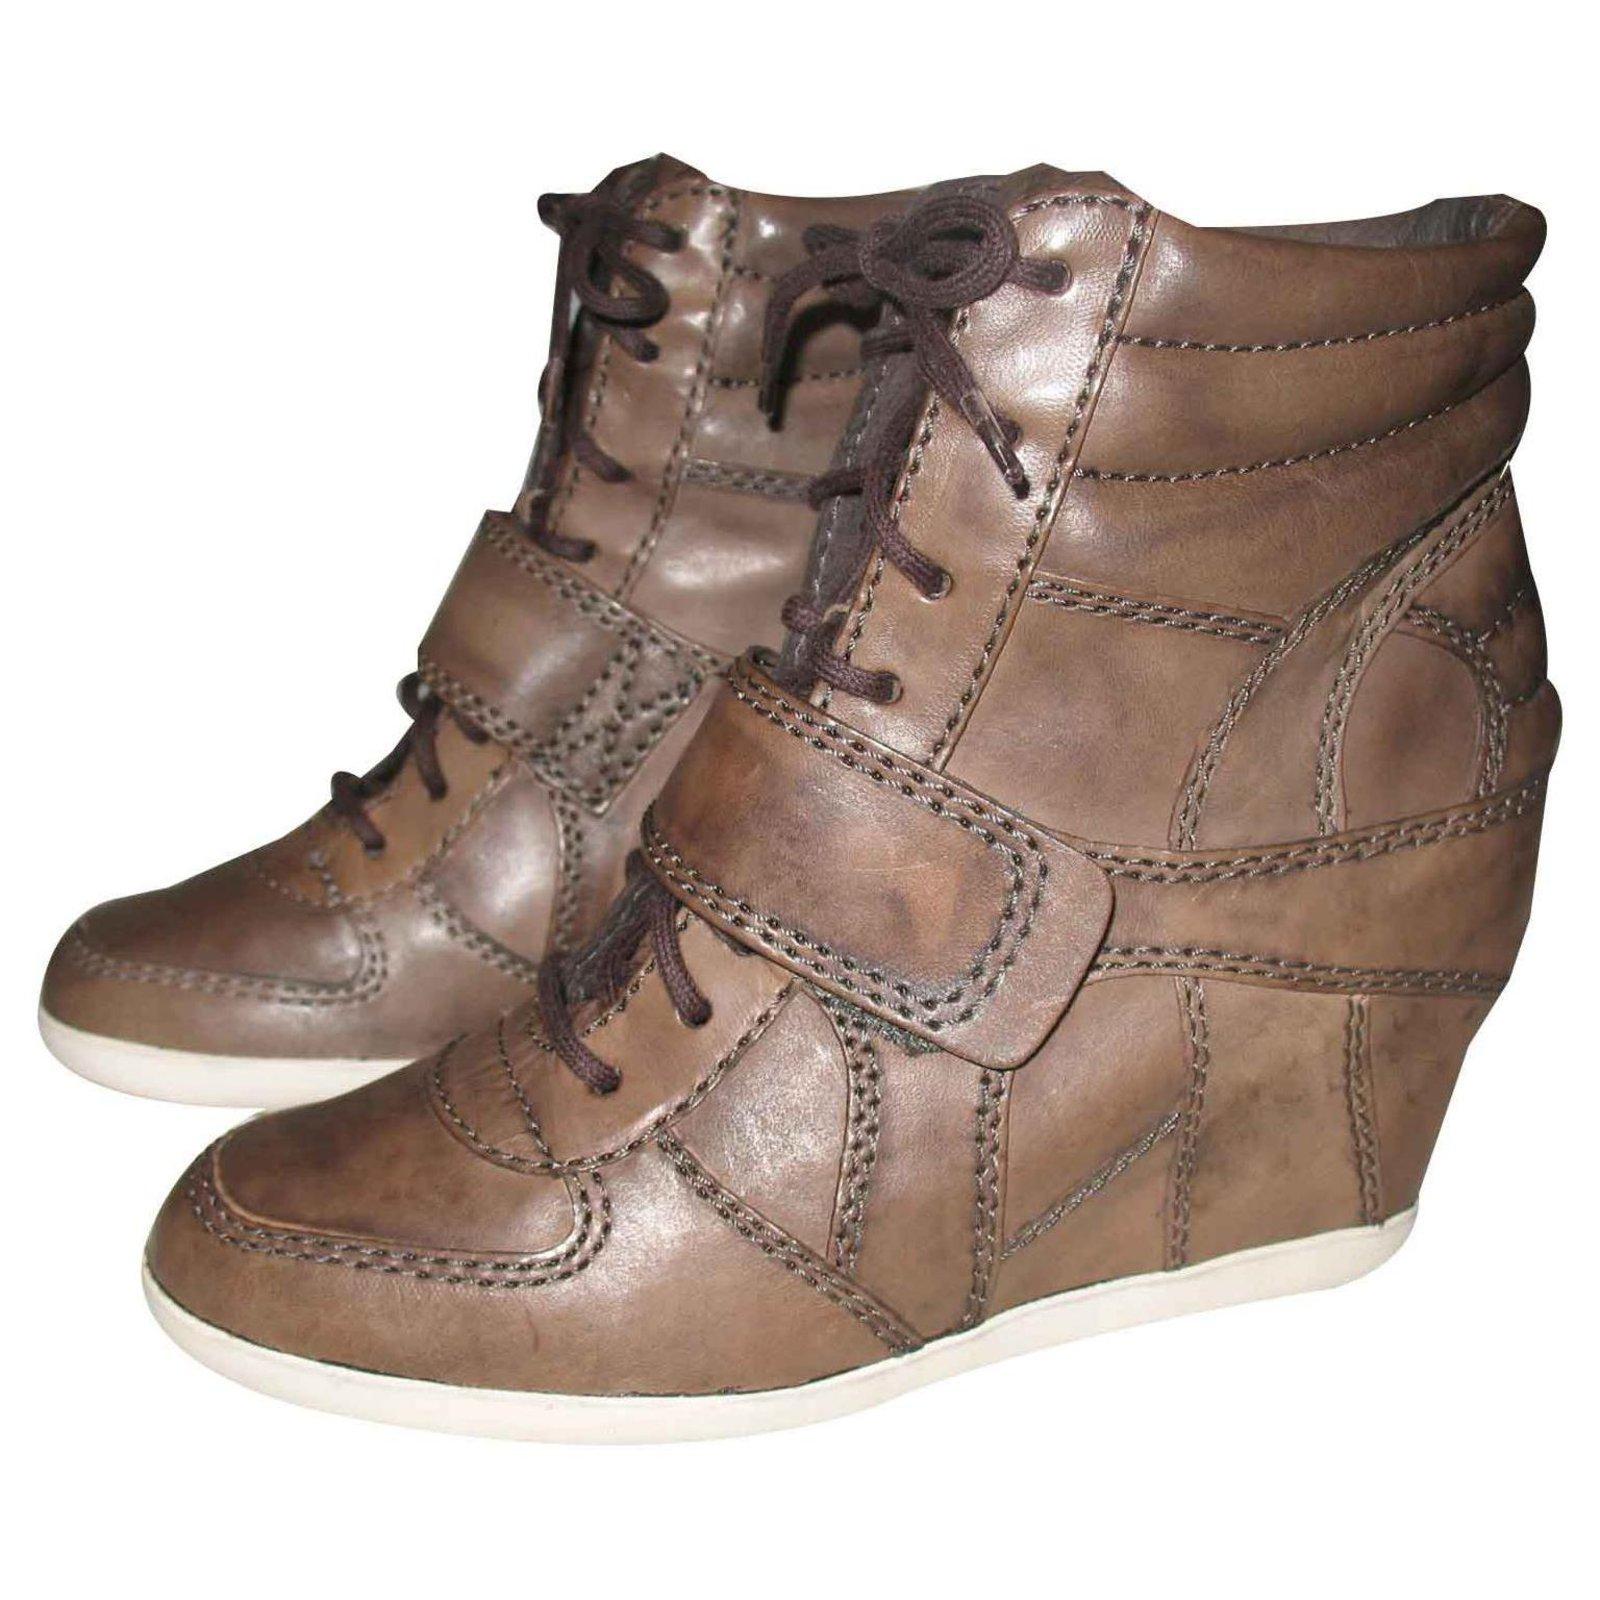 Ash Ash brown leather sneakers Sneakers